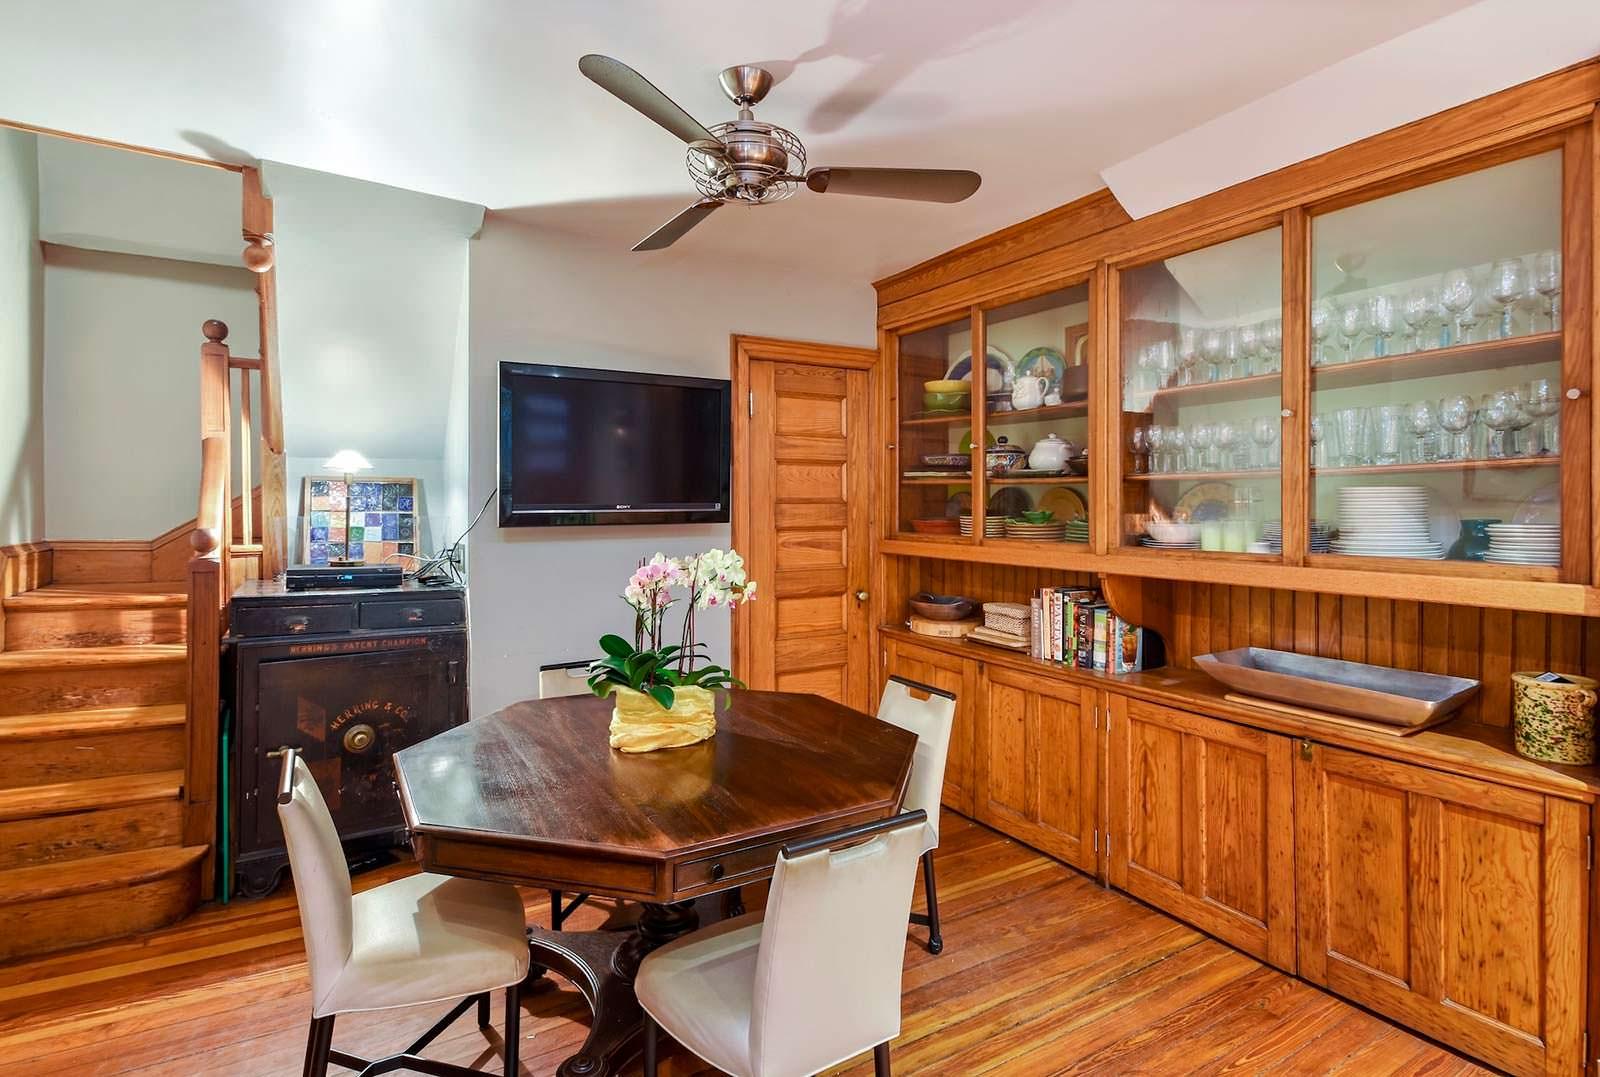 Фото | Обеденный стол на кухне